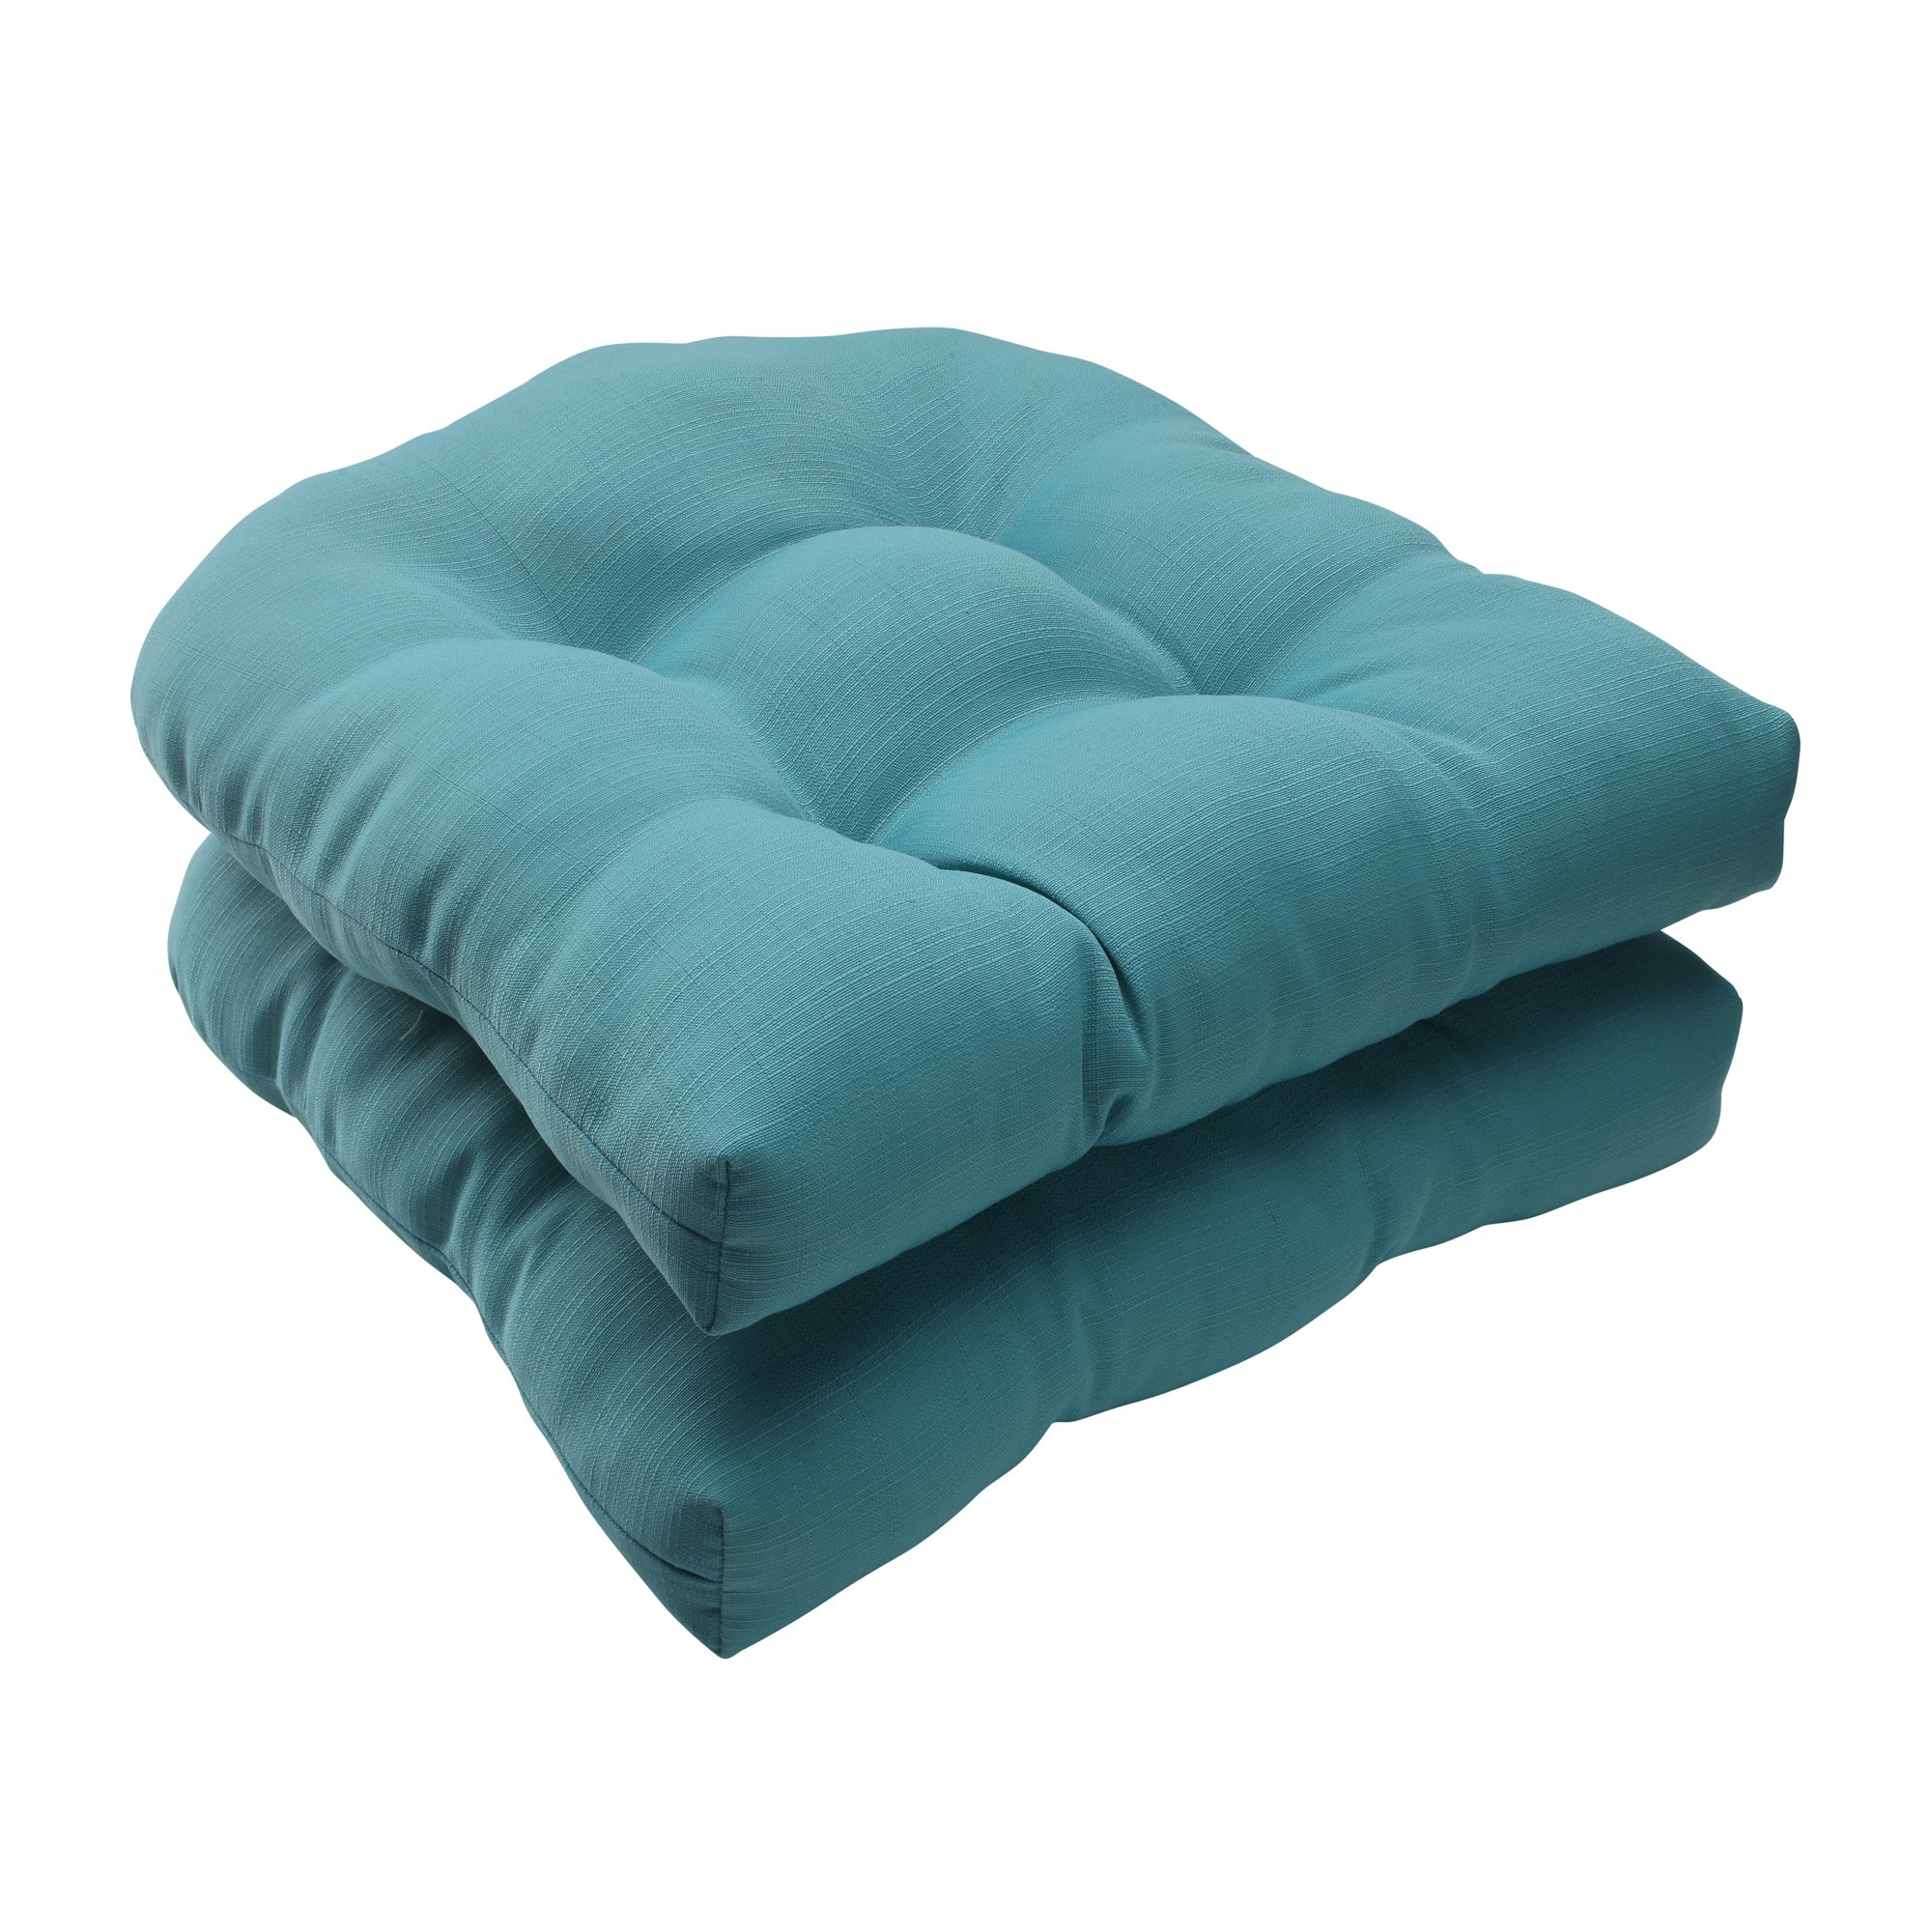 Pillow Perfect Indoor/Outdoor Forsyth Wicker Seat